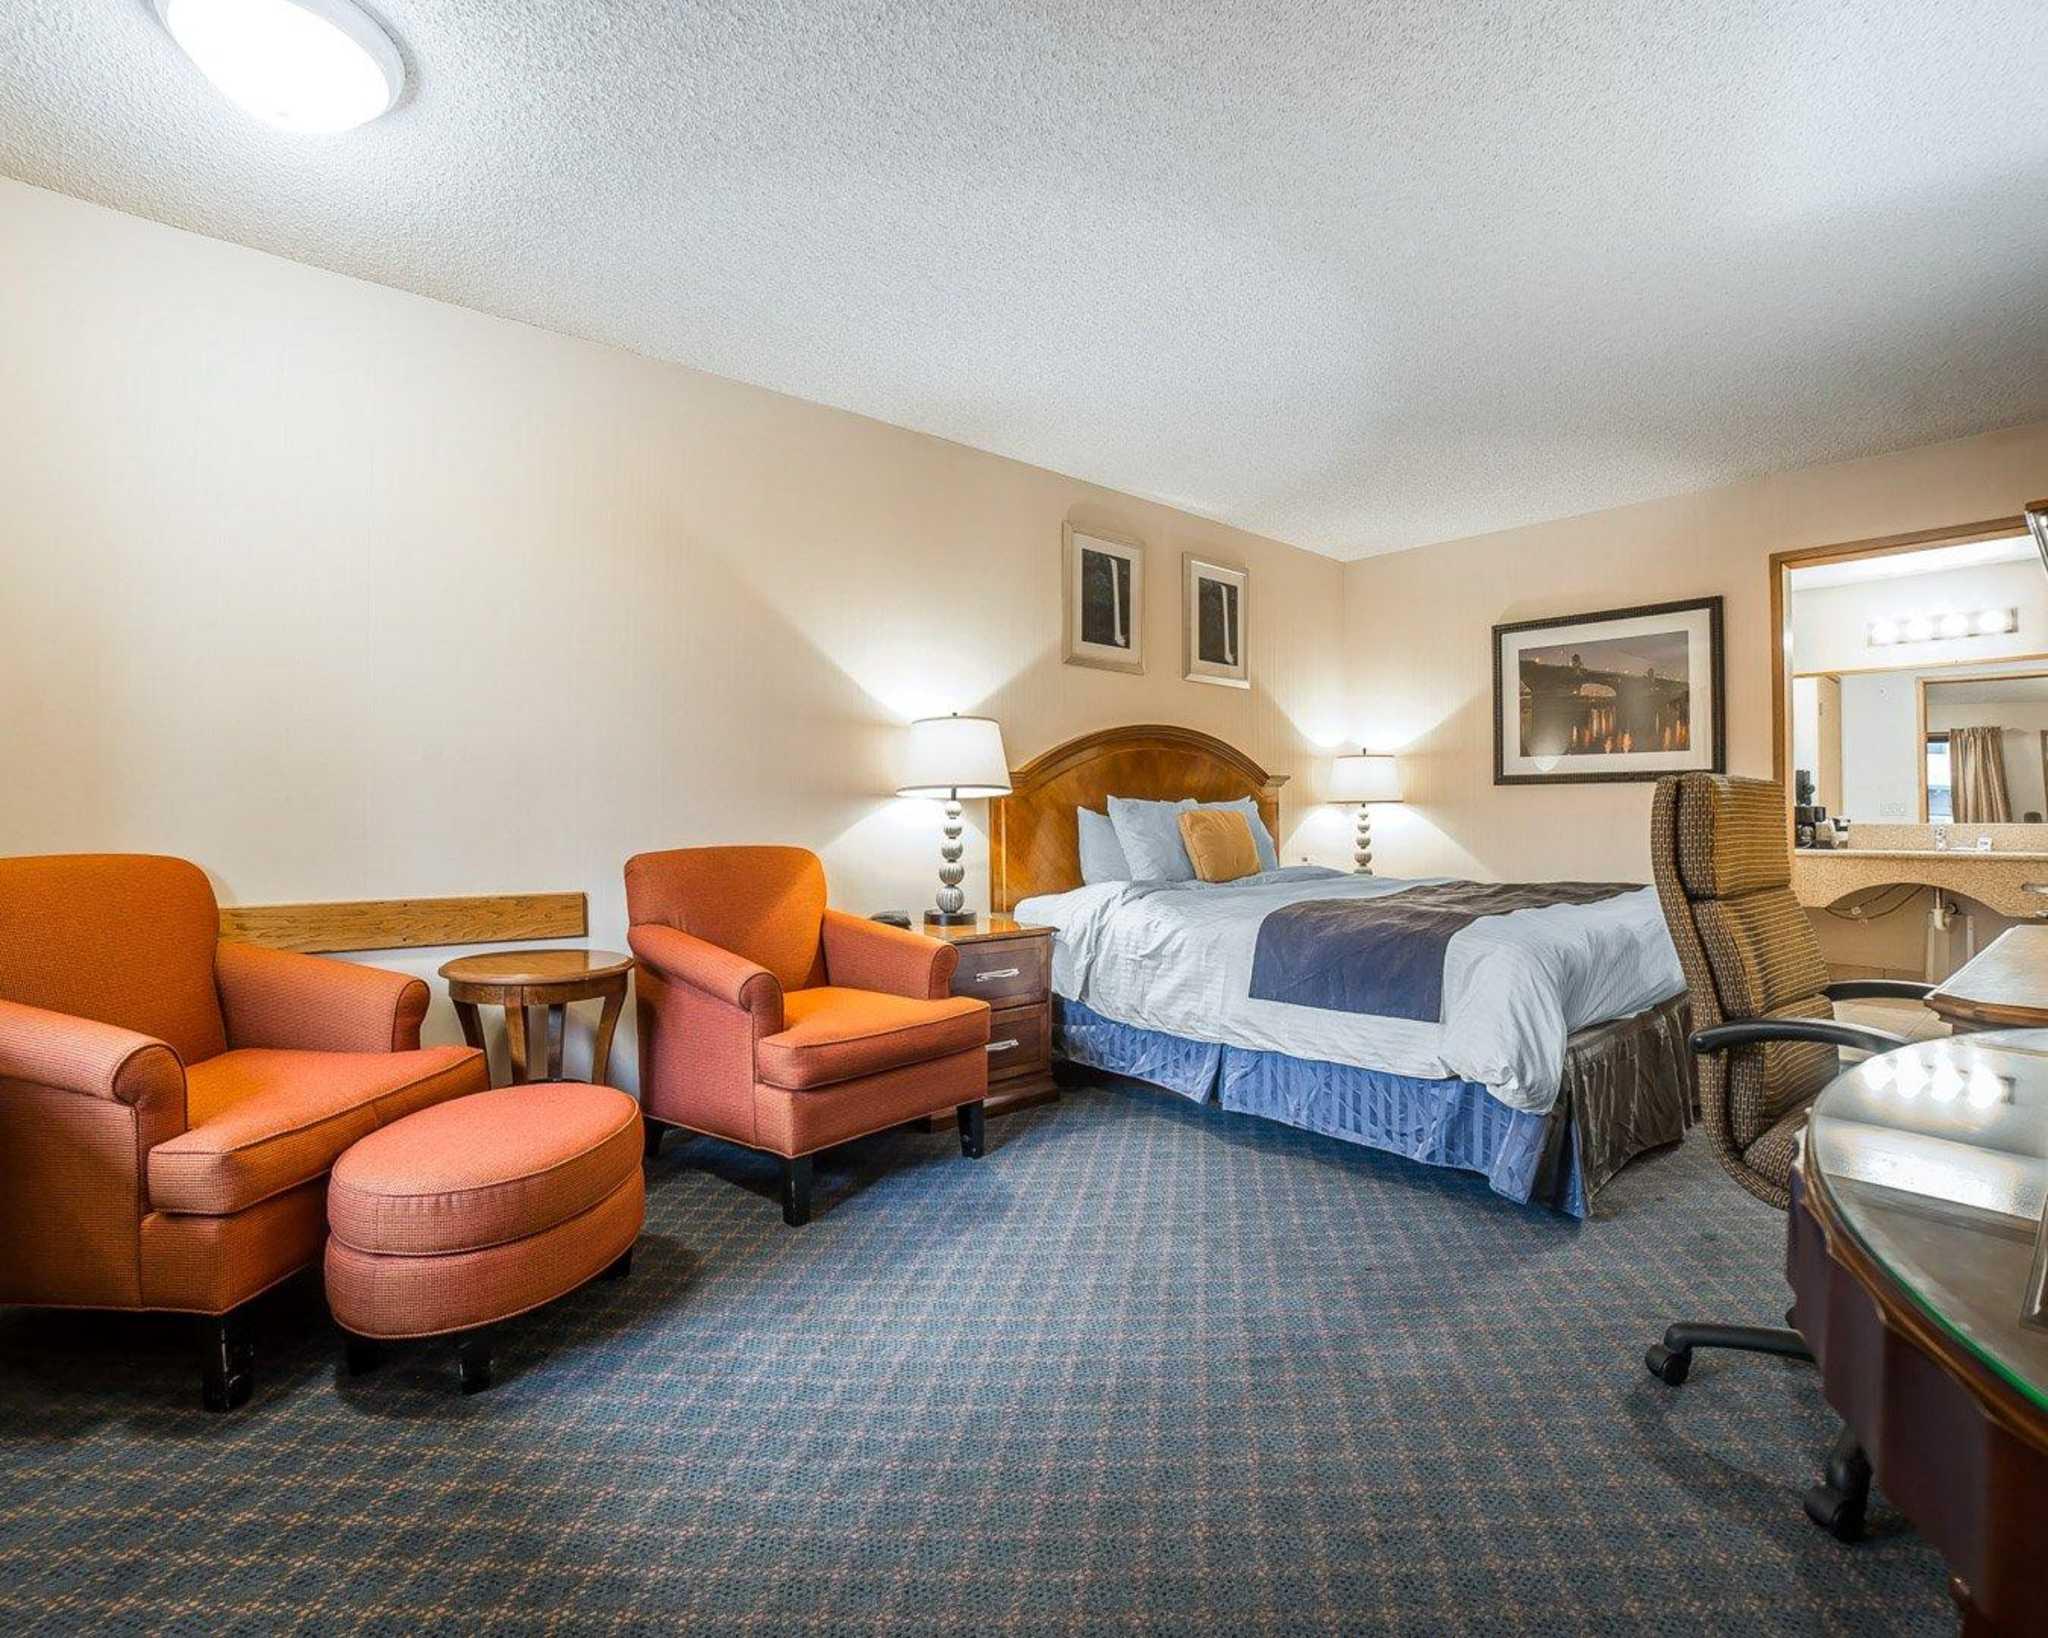 Rodeway Inn image 24